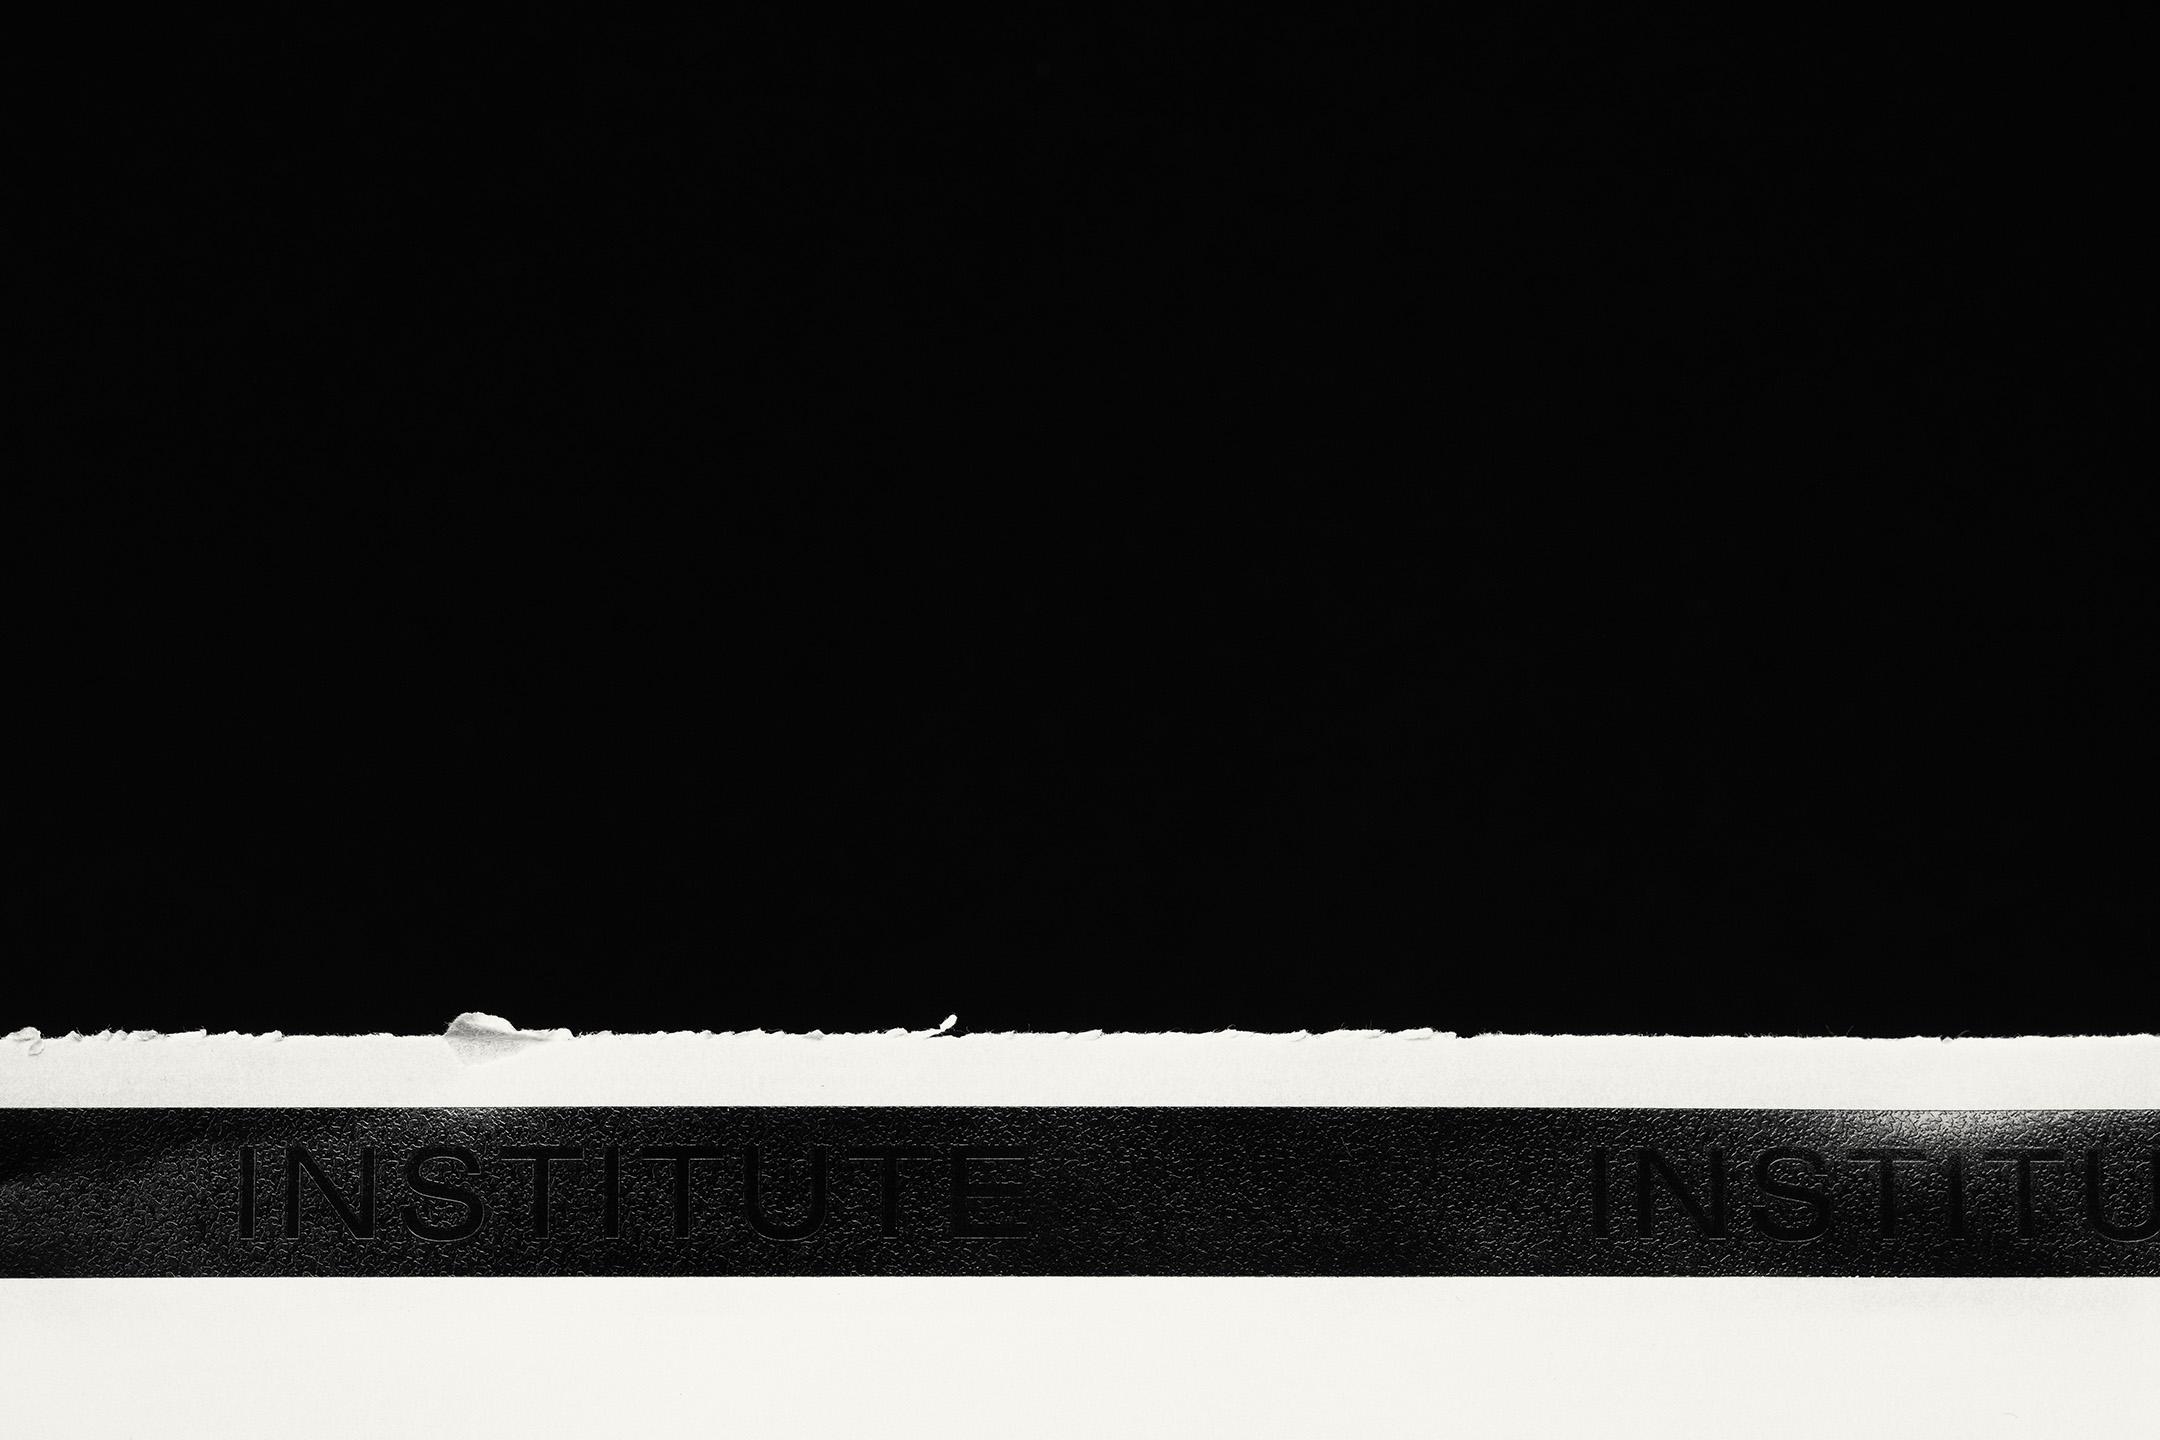 02-Institute-Branding-Design-Commission-Studio-London-UK-BPO